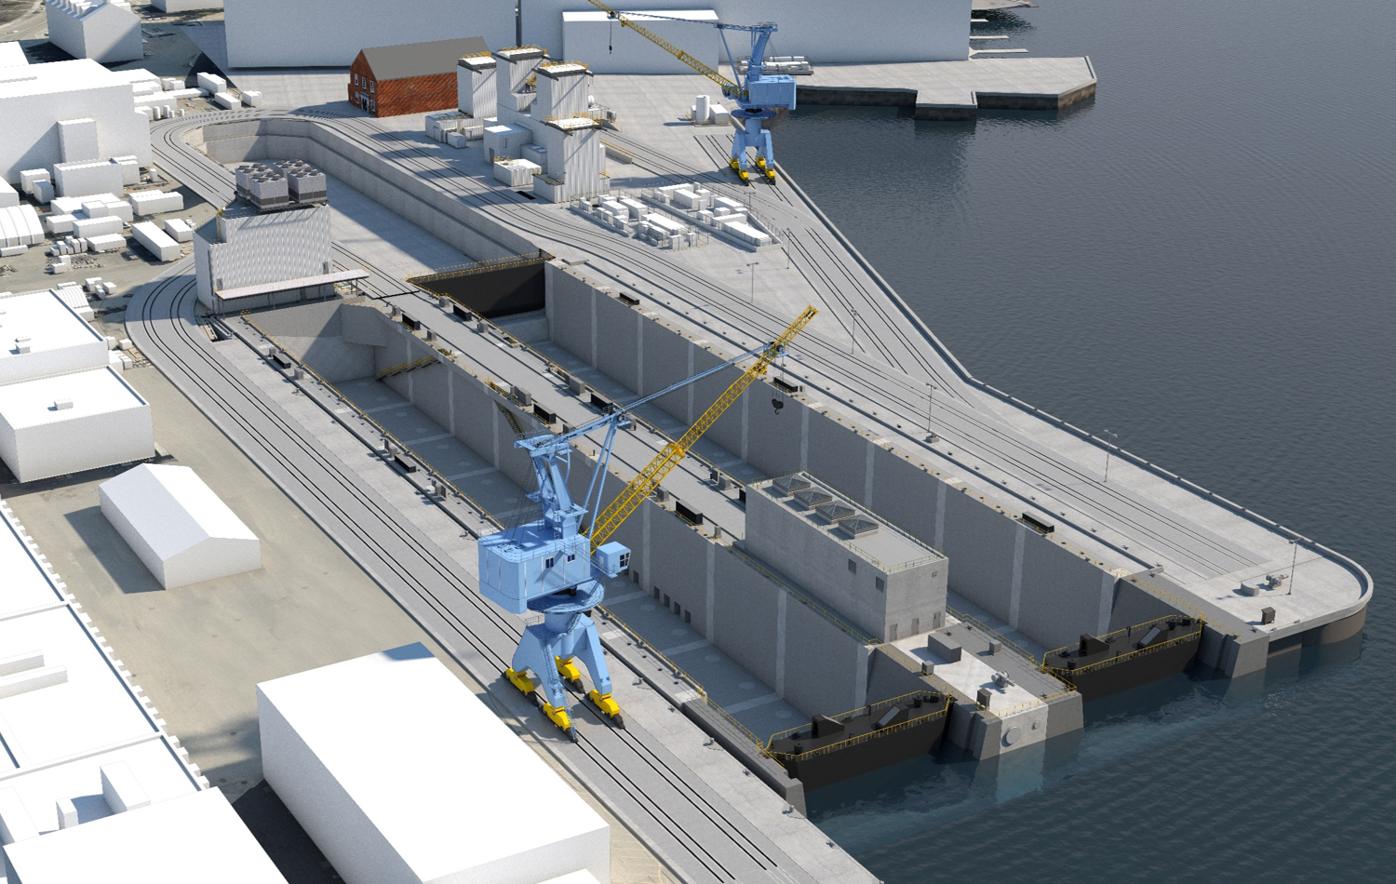 Rendering of PNSY dry docks